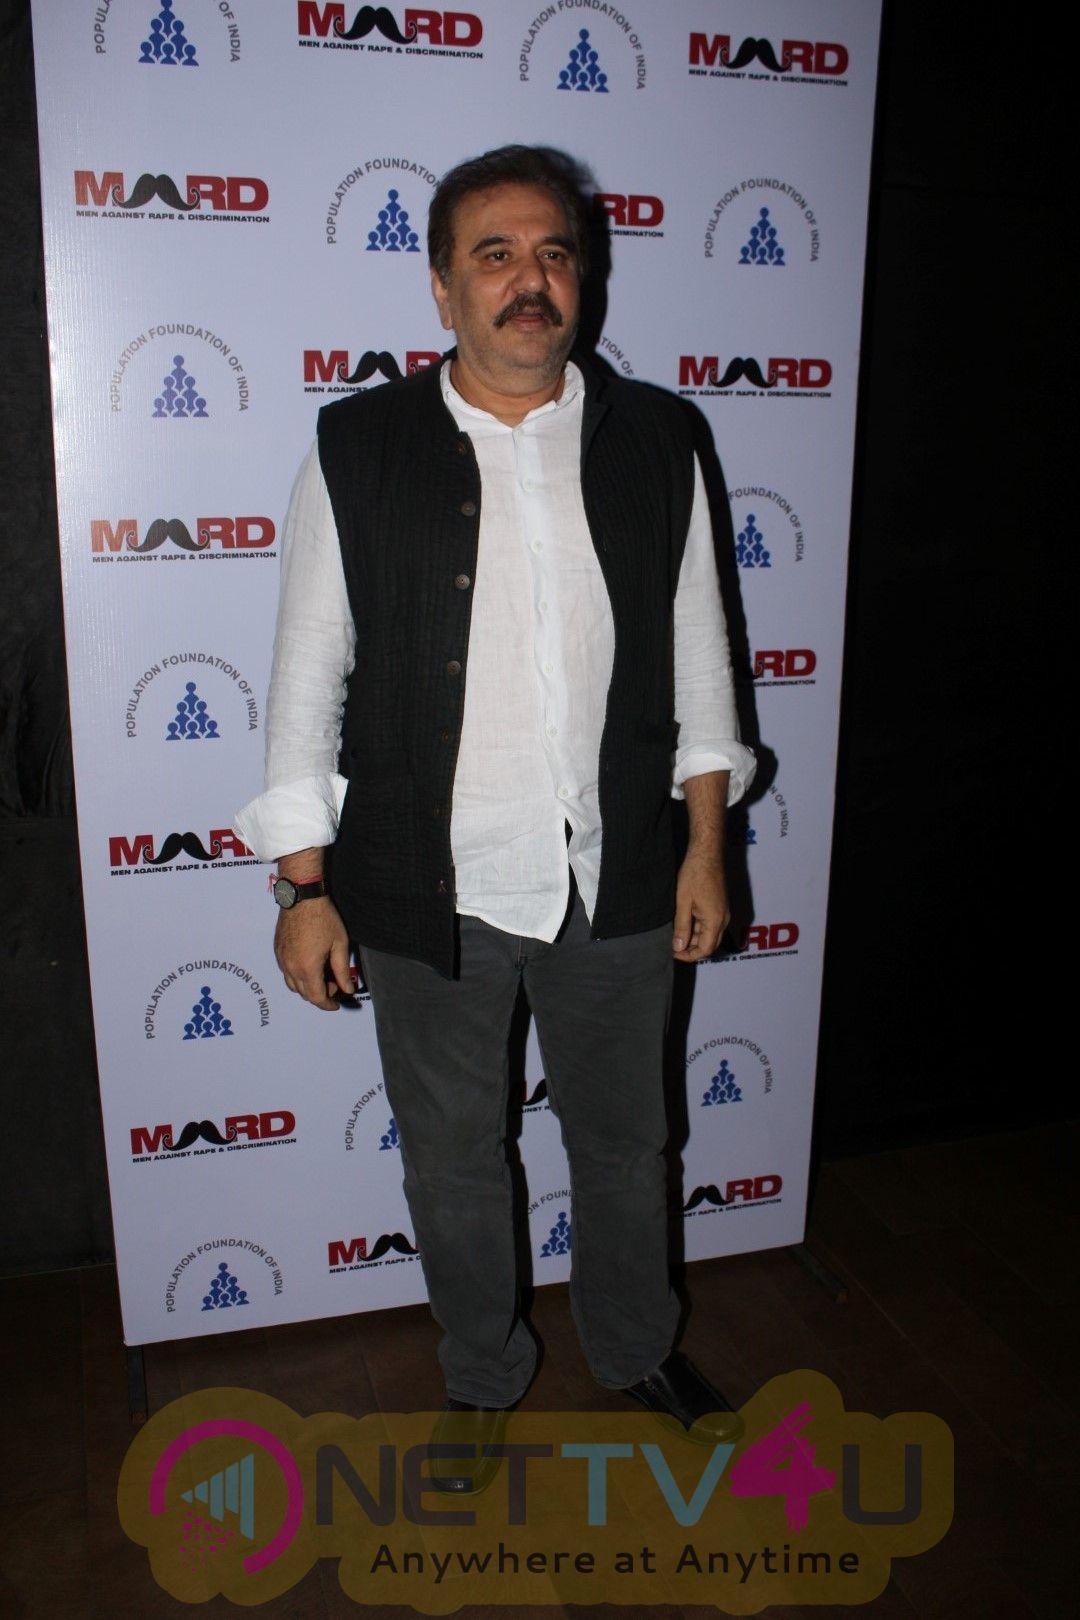 Pc Of Bas Ab Bahut Ho Gaya Campaign & Concert With Farhan Akhtar Pics Hindi Gallery